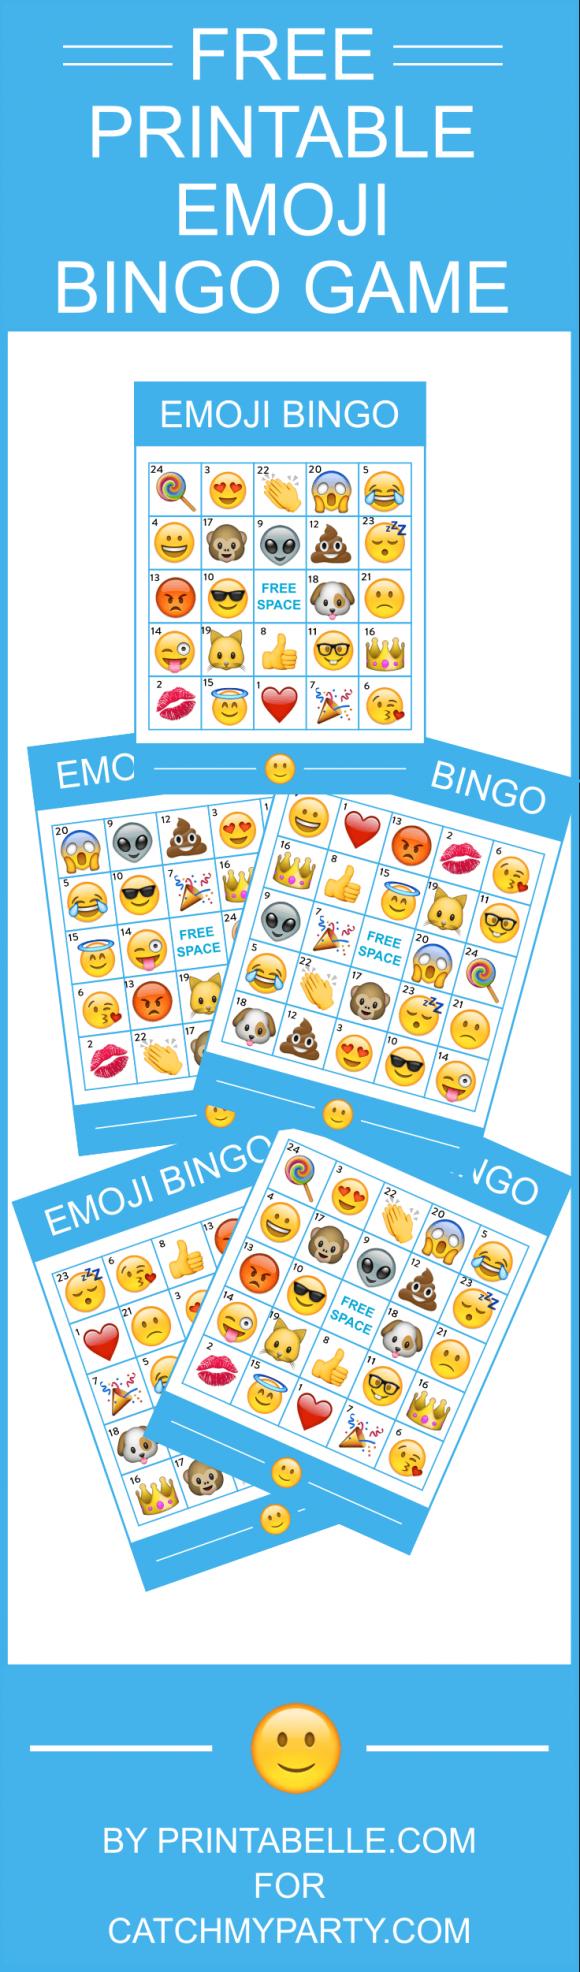 Free Printable Emoji Bingo Game -- comes with 8 bingo cards and ...